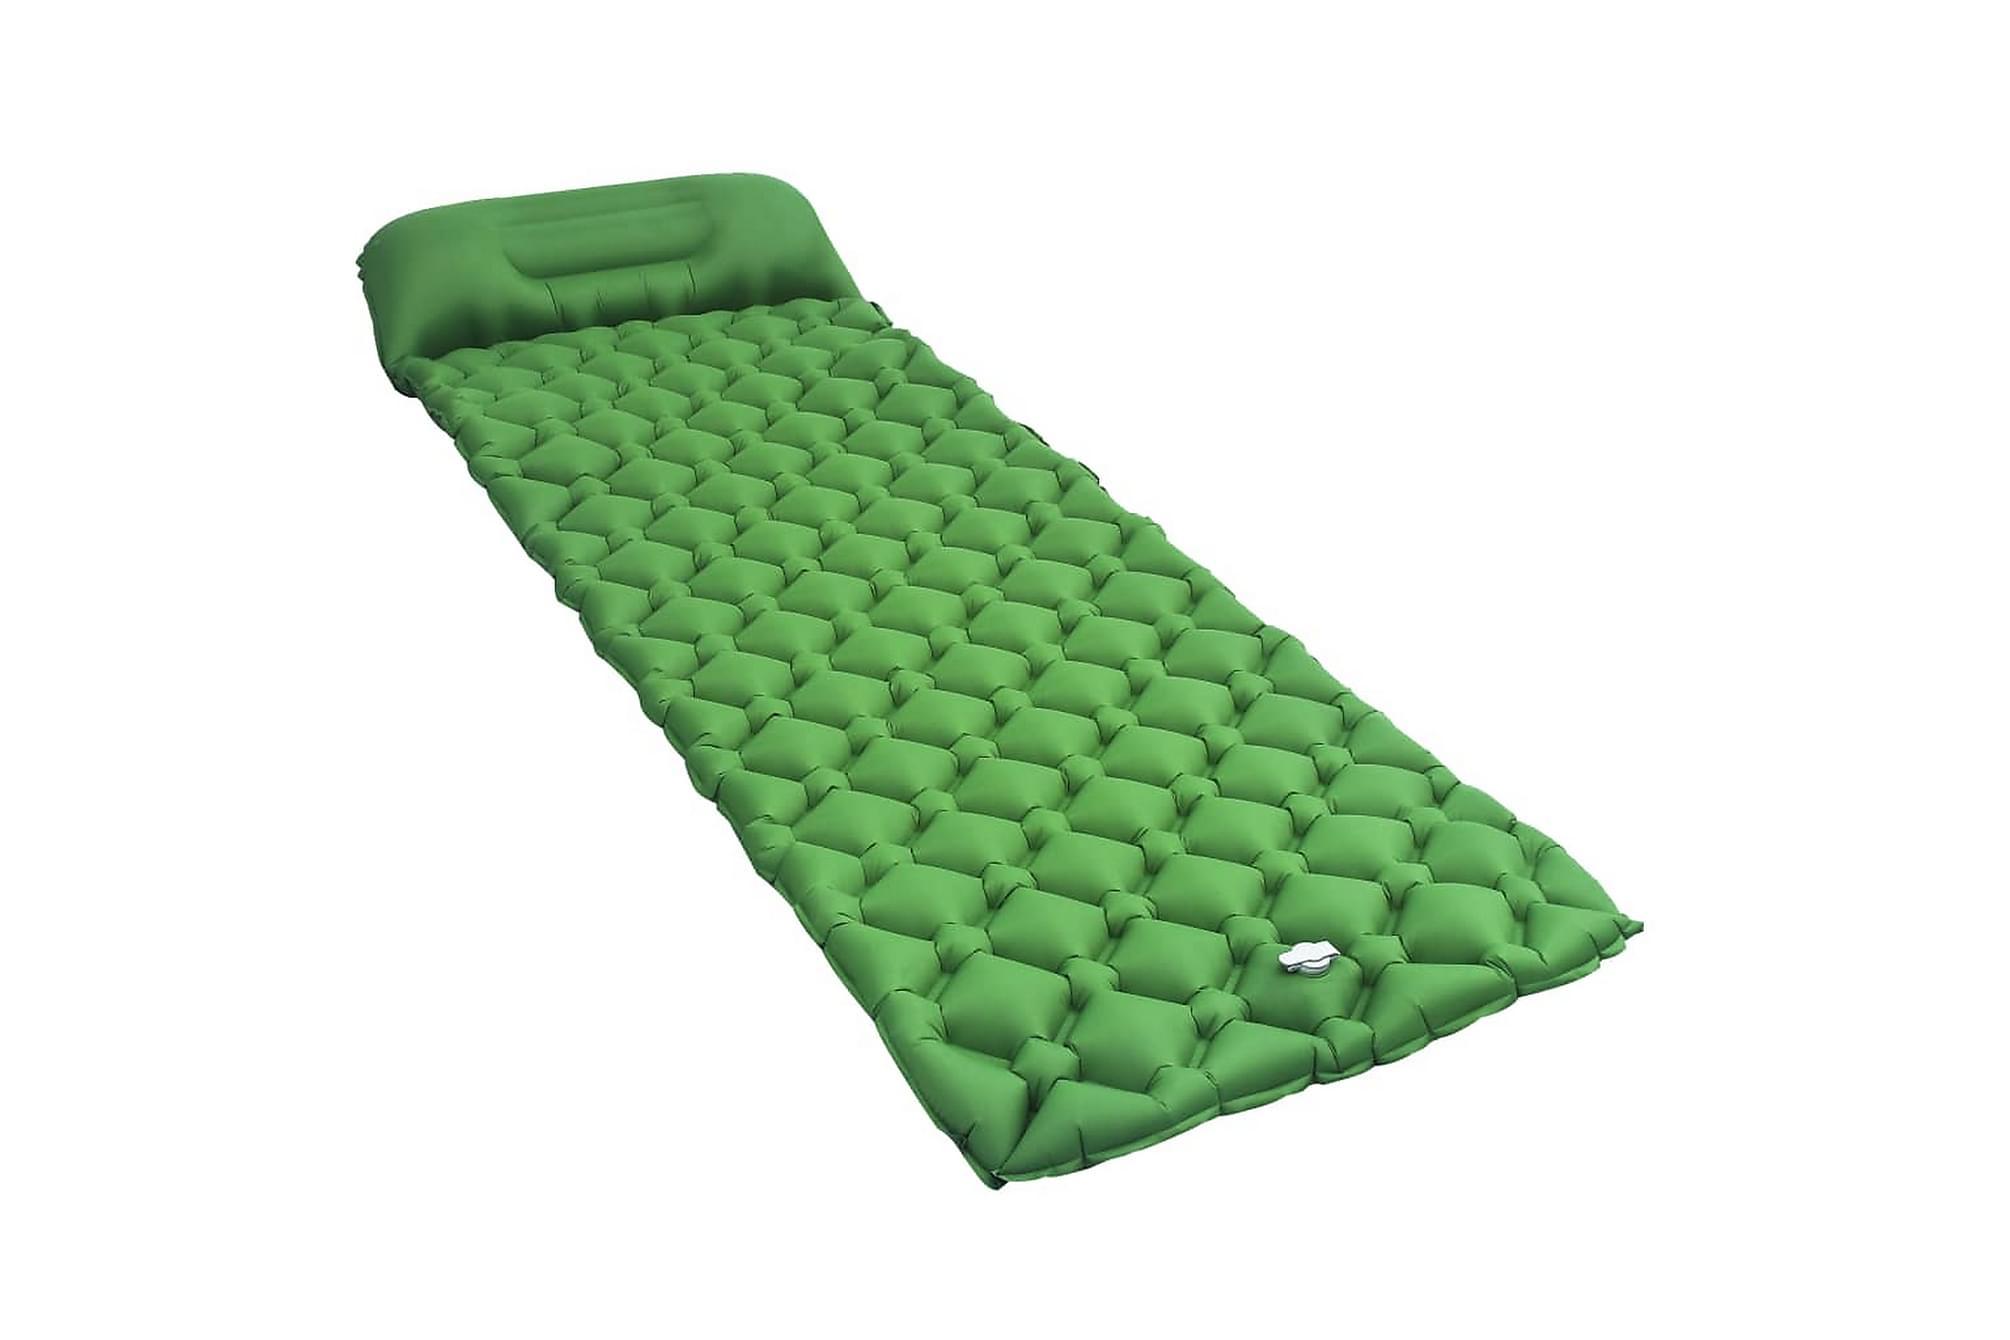 Luftmadrass med kudde 58x190 cm grön, Luftmadrasser & uppblåsbara madrass